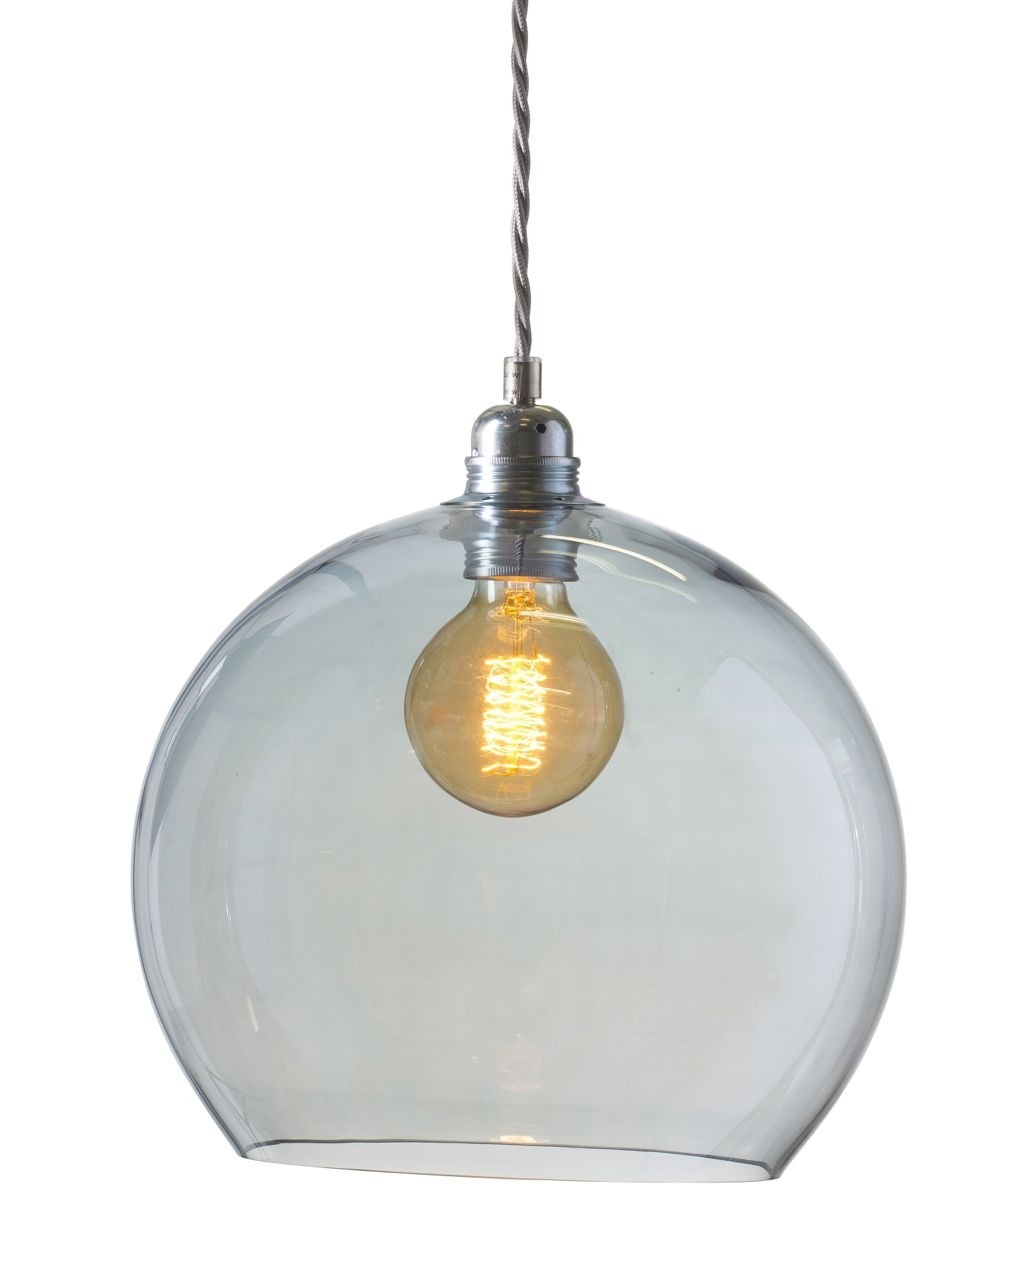 Orb glass pendant 28 cm   topaz blue, silver wire